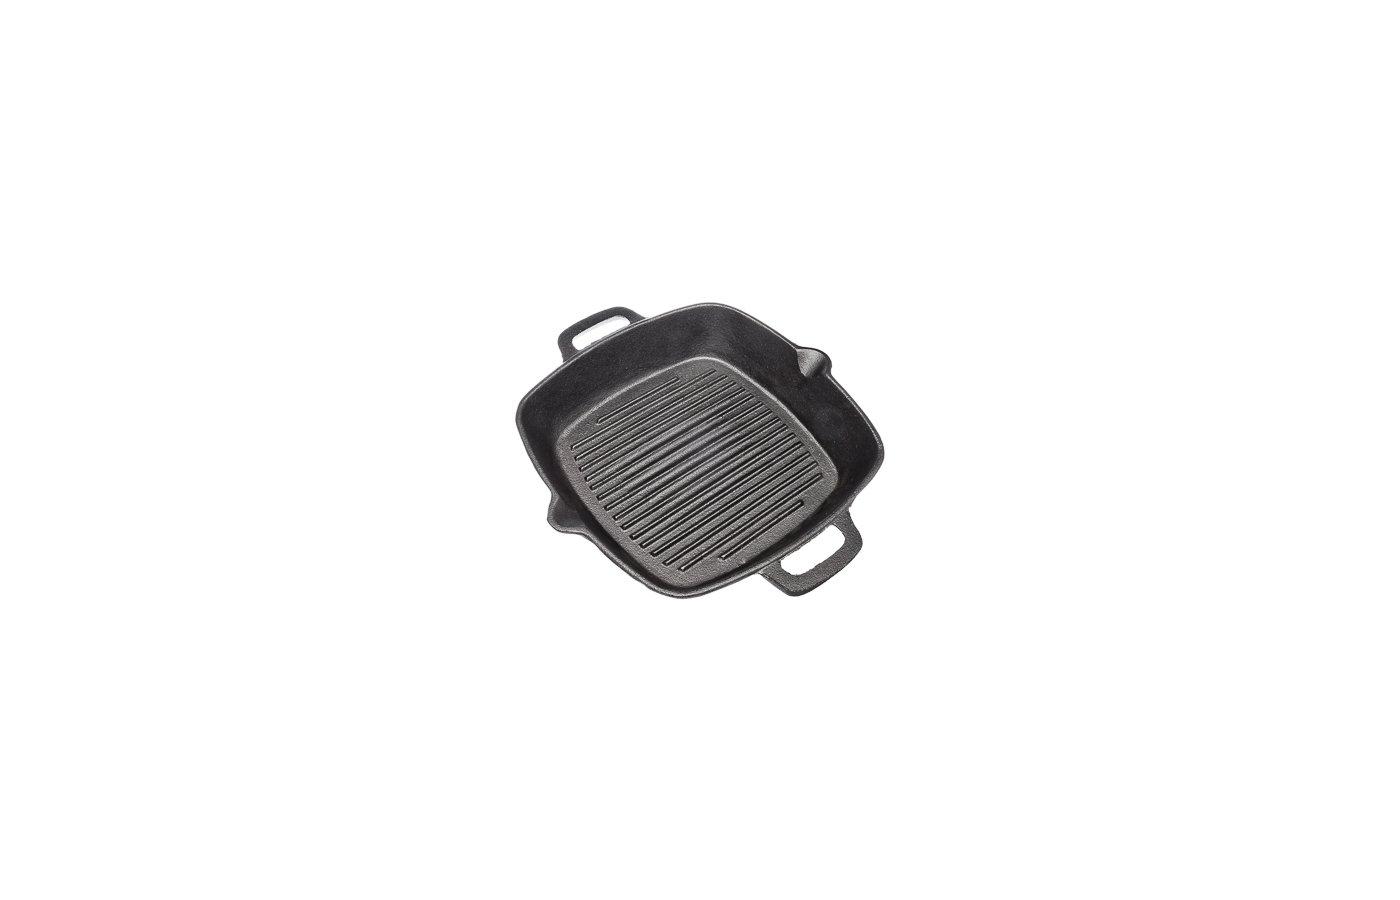 Сковорода - гриль VETTA 808-004 Сковорода-гриль чугун 26х26х45 см